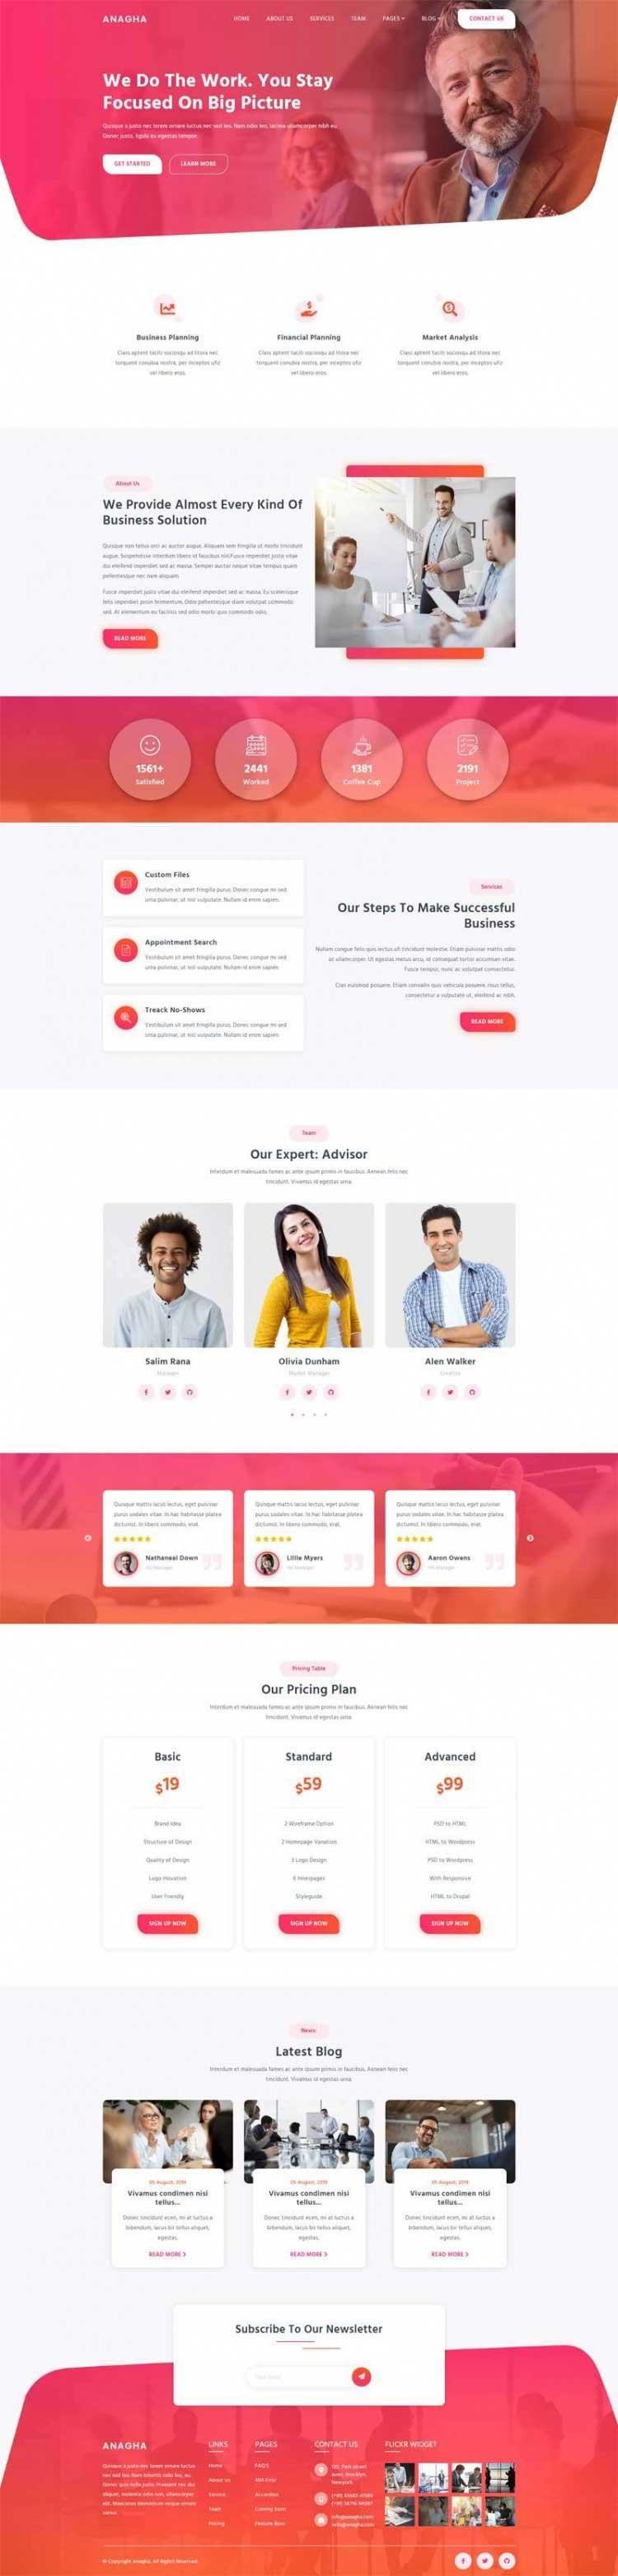 Bootstrap响应式企业咨询商业咨询公司网站模板